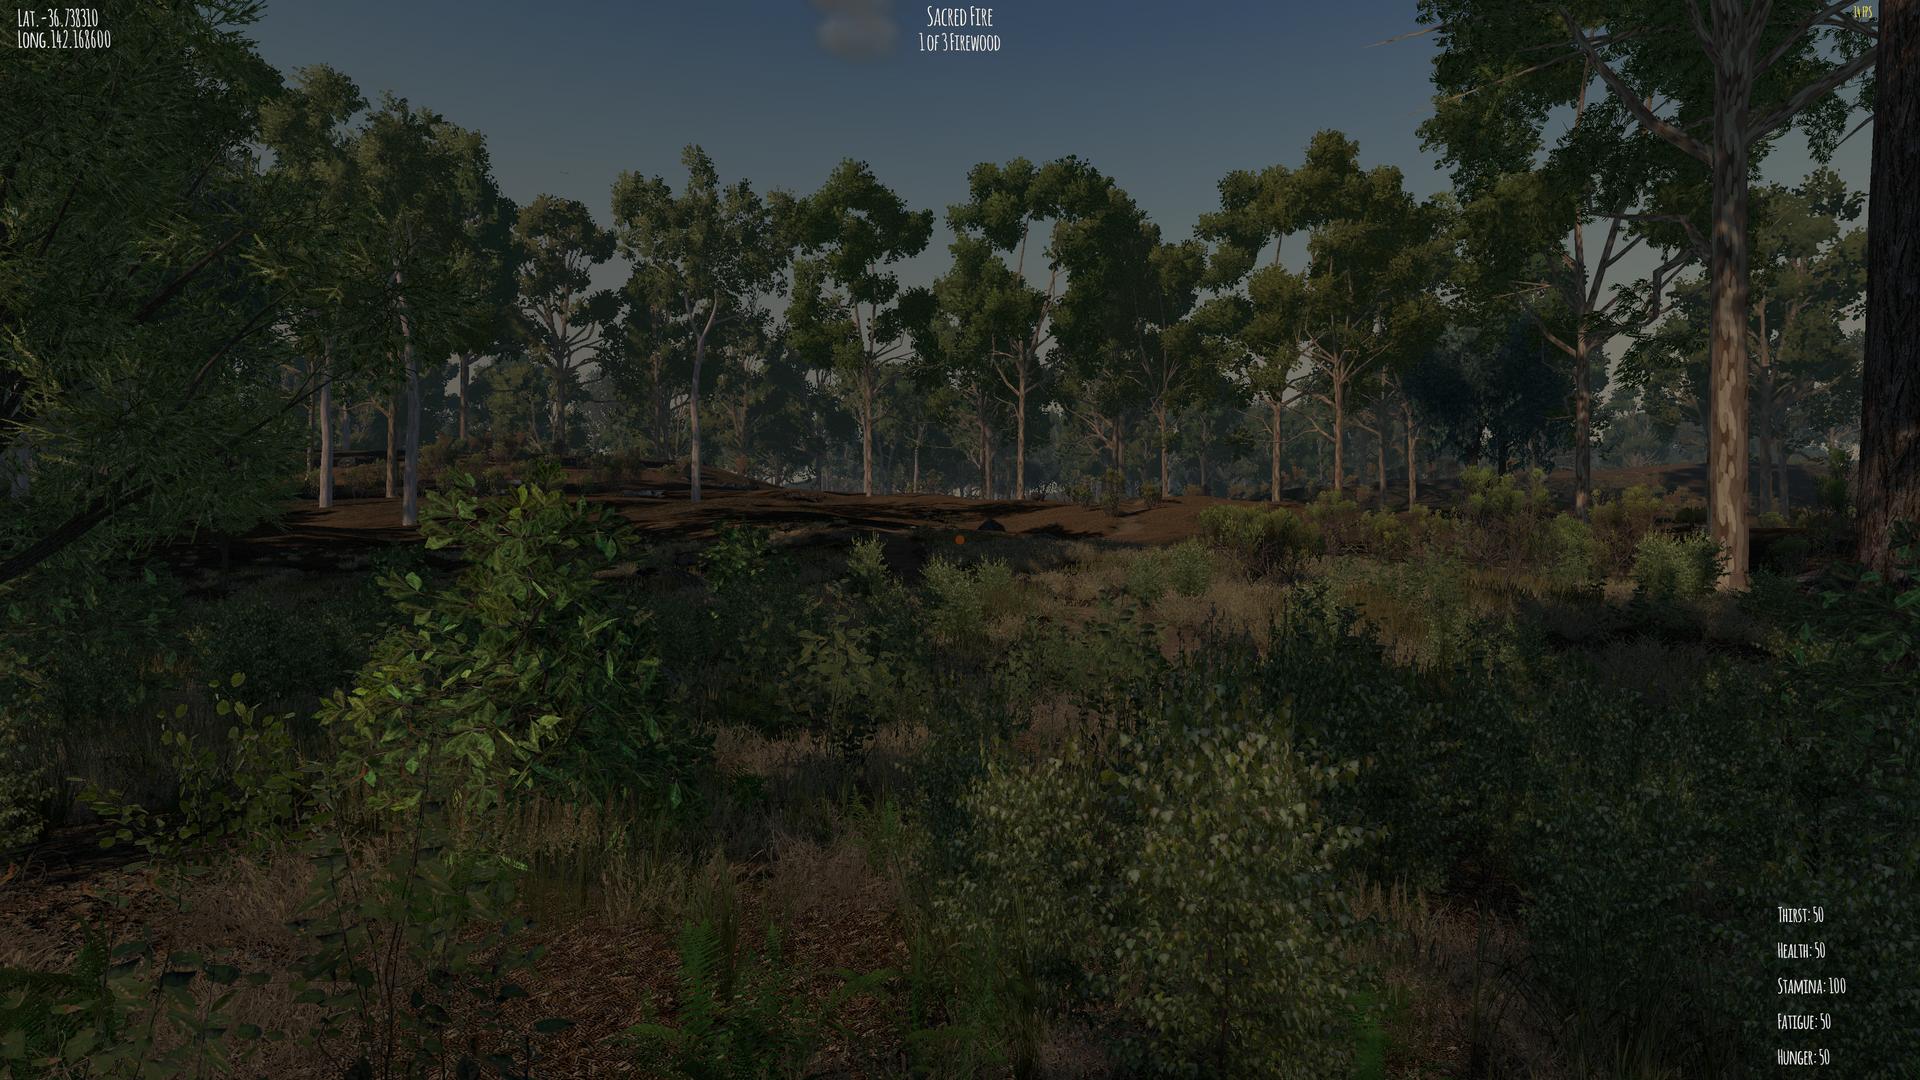 Screenshot (83).png